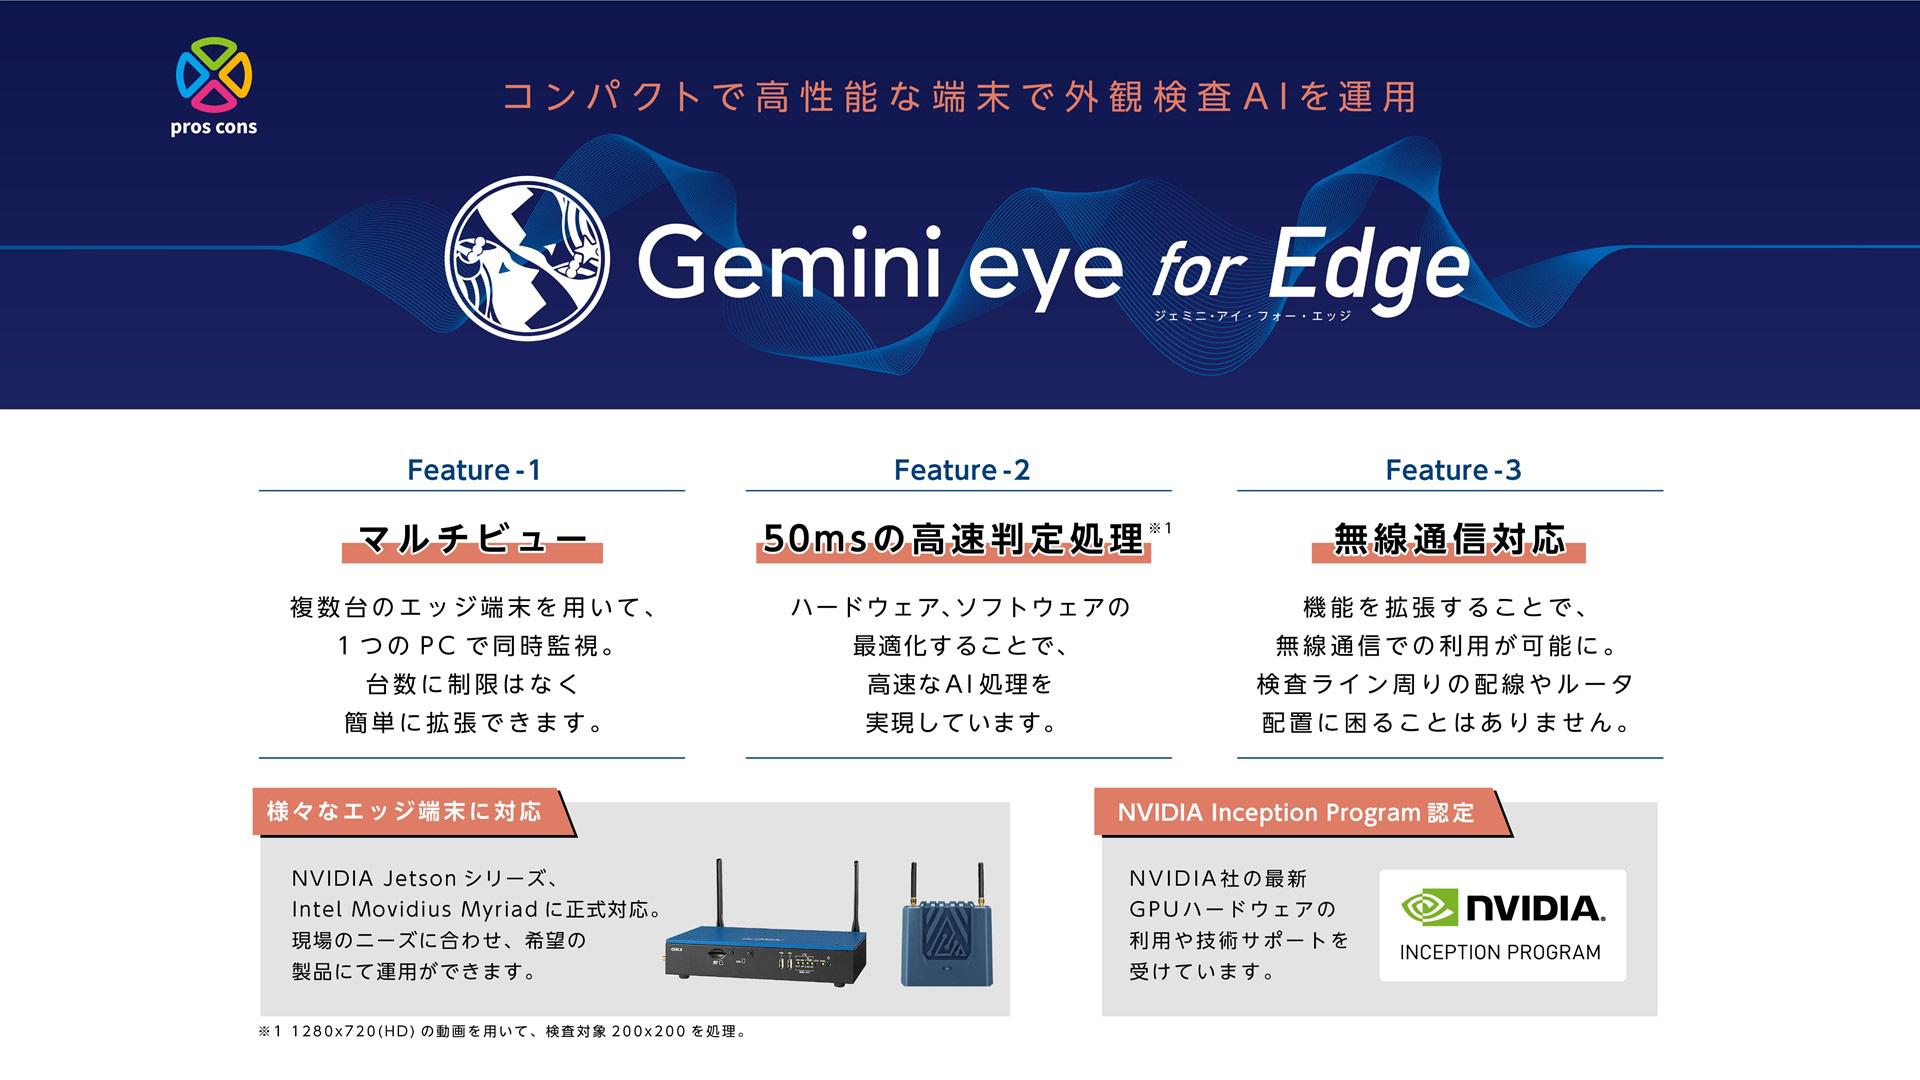 Gemini eye for Edge